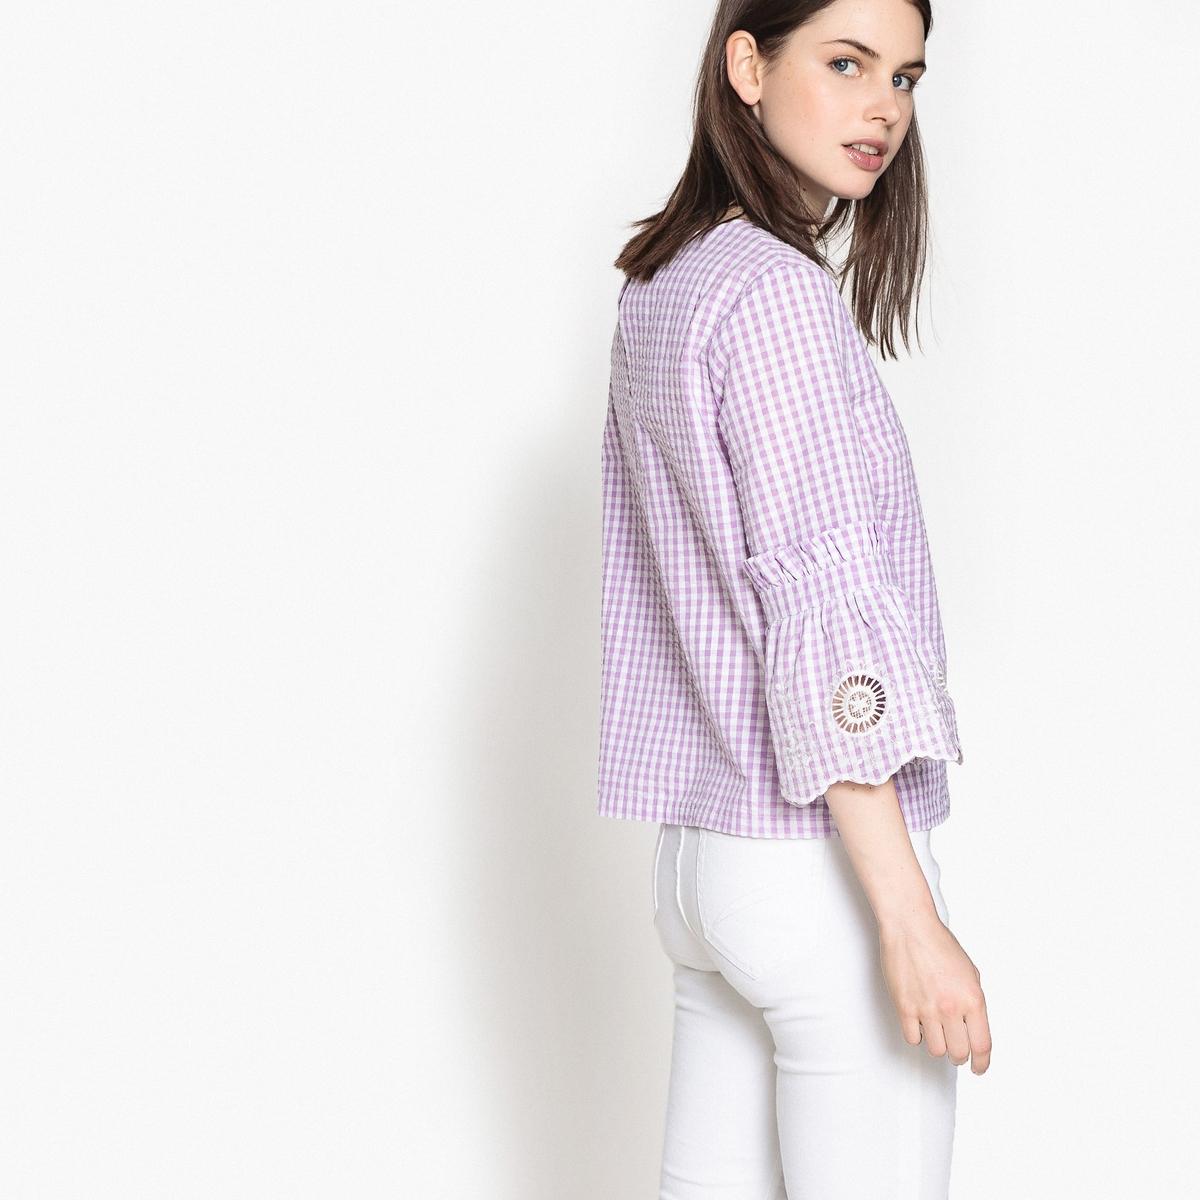 Blusa com estampado vichy, mangas largas bordadas